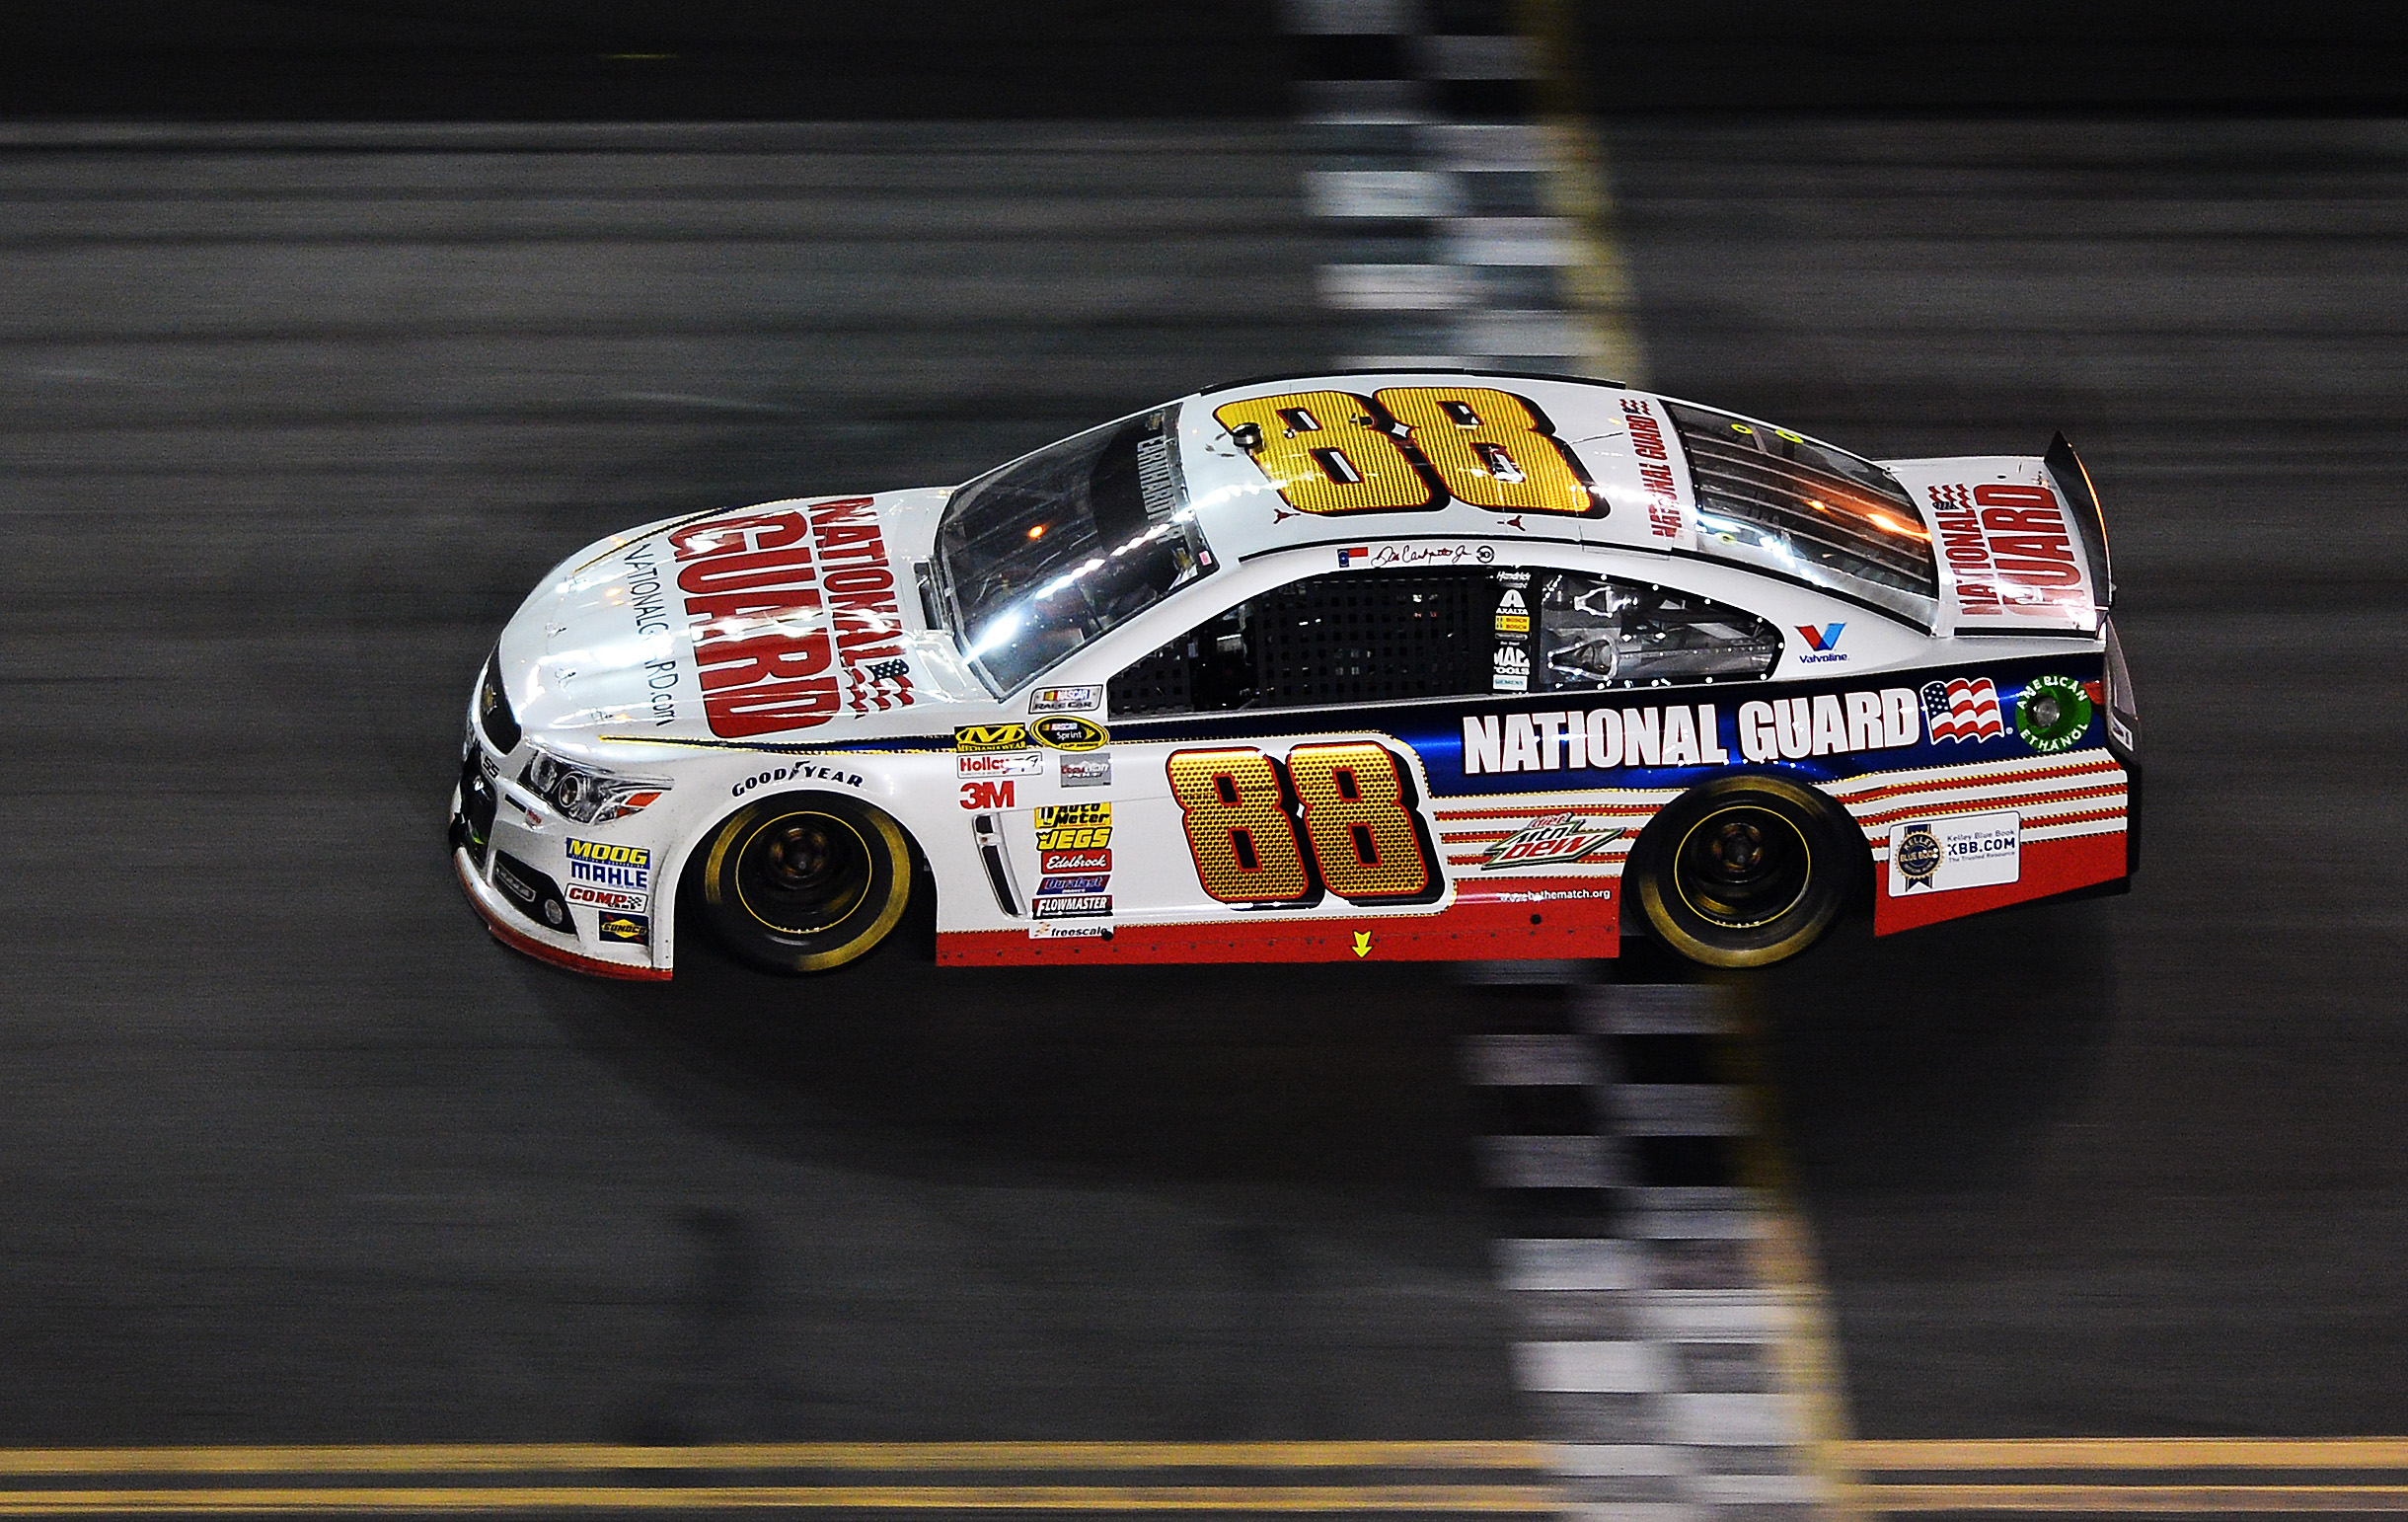 Dale Earnhardt Jr., driver of the #88 National Guard Chevrolet, crosses the finishline to win the NASCAR Sprint Cup Series Daytona 500 at Daytona International Speedway on Fec. 23, 2014 in Daytona Beach, Fla.